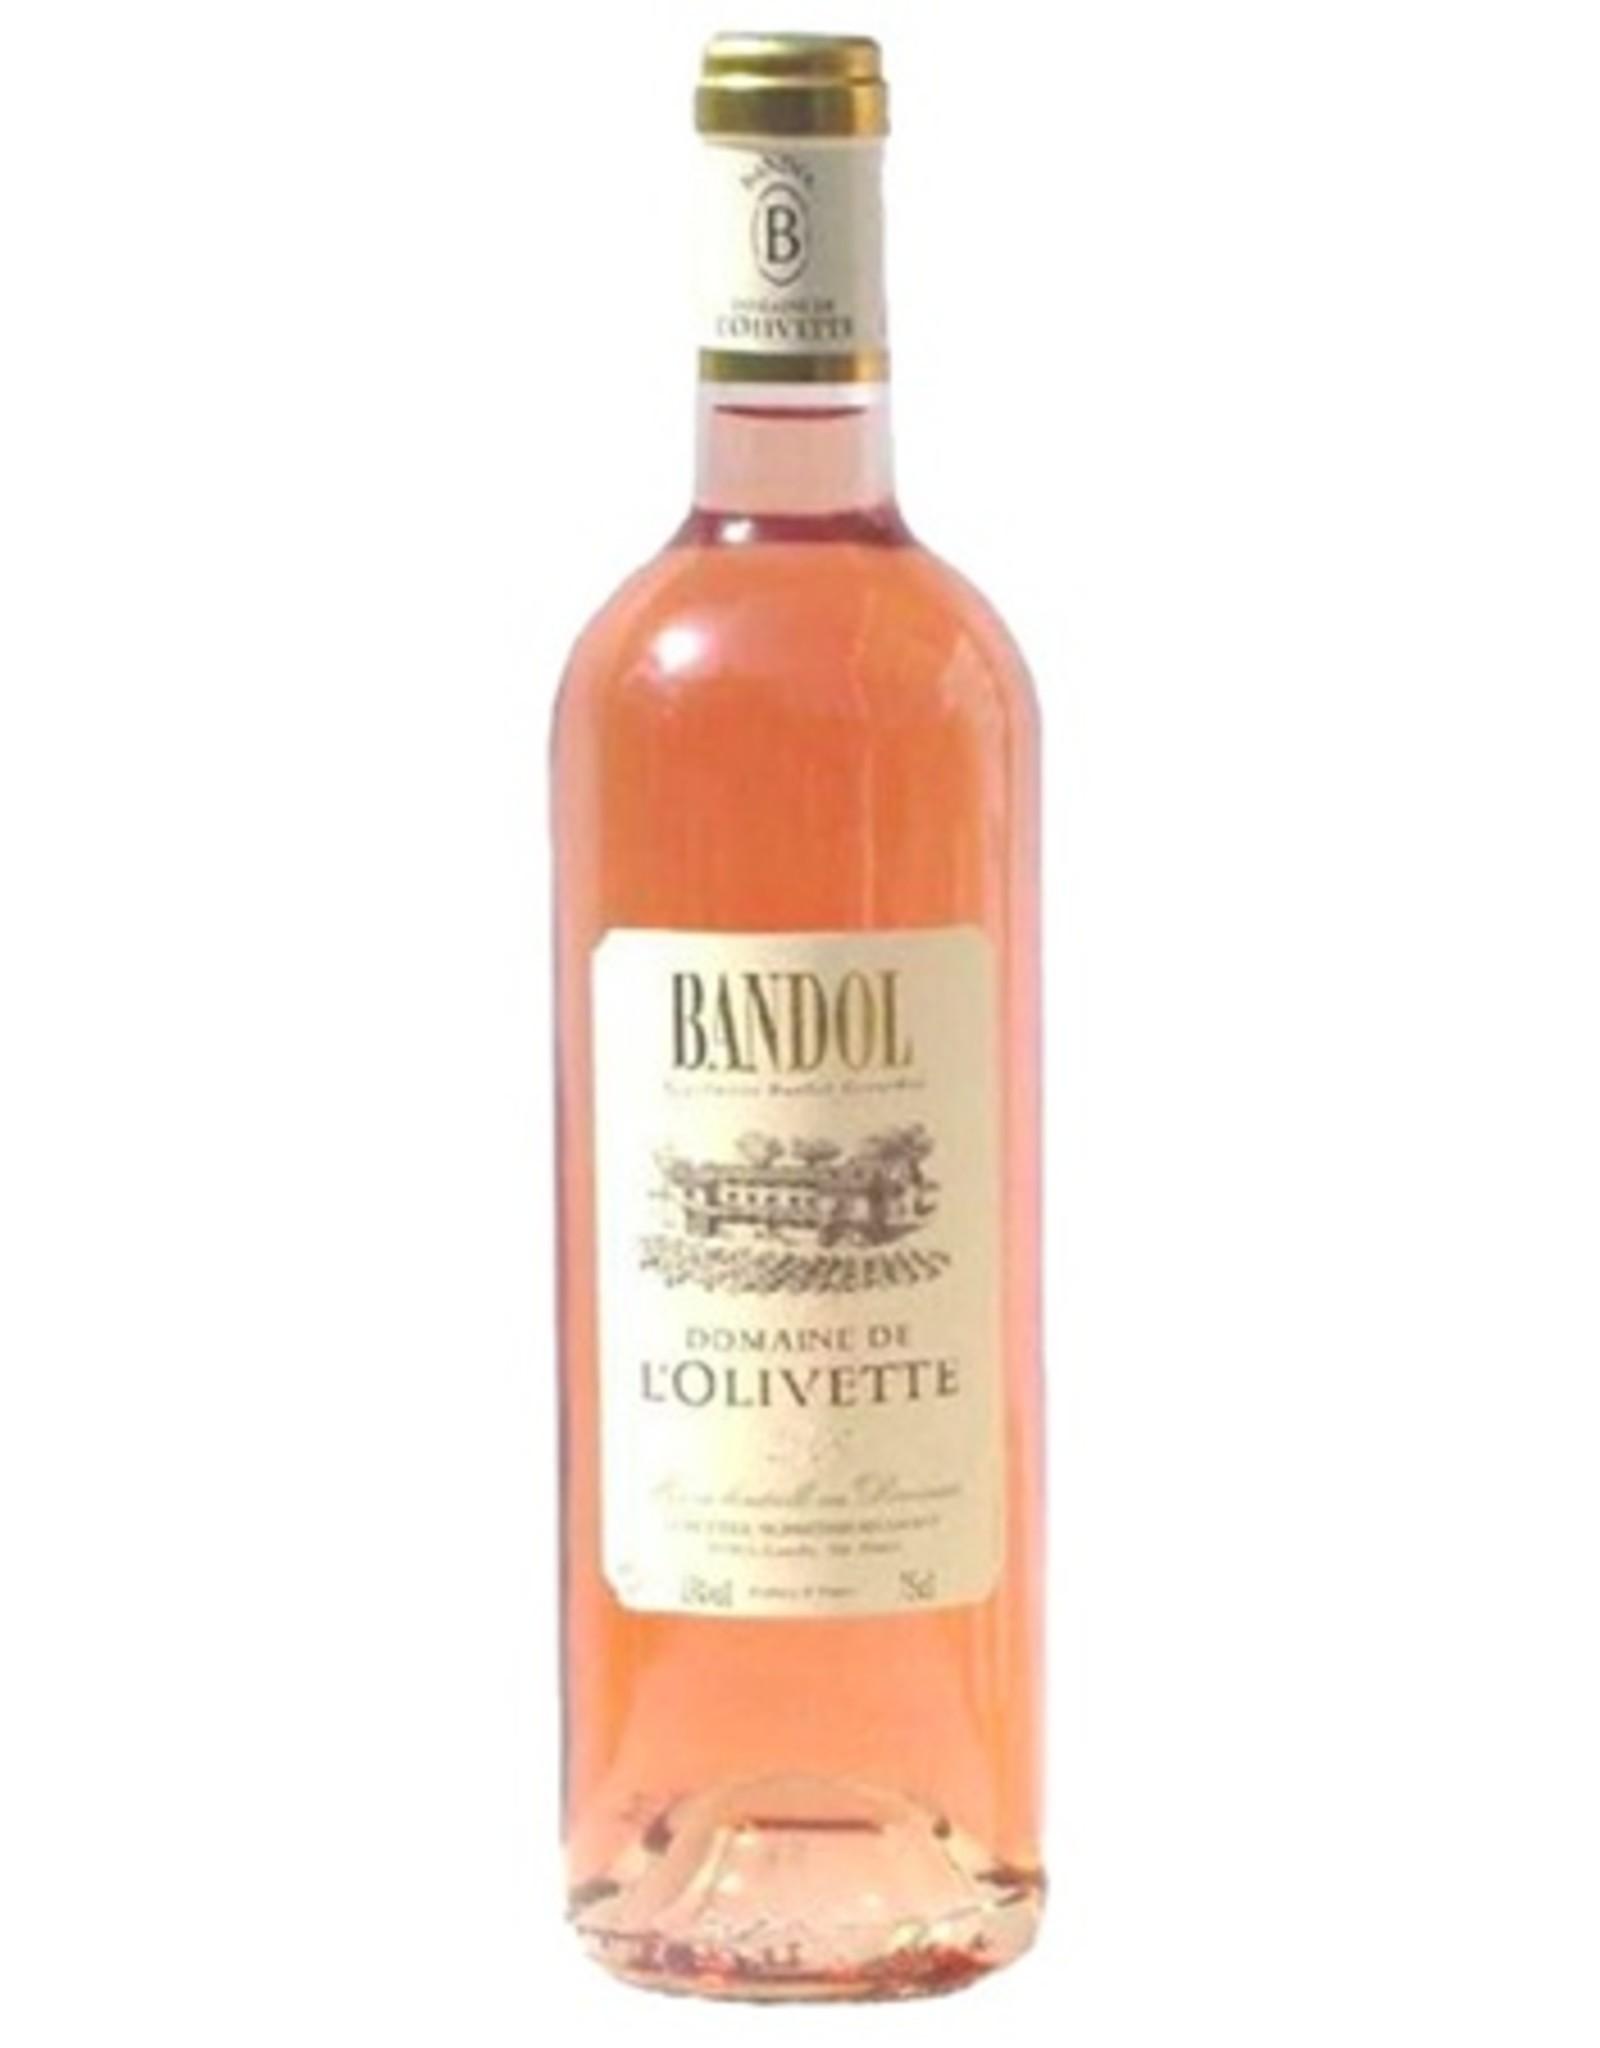 Domaine de L'Olivette Bandol Rose 2019